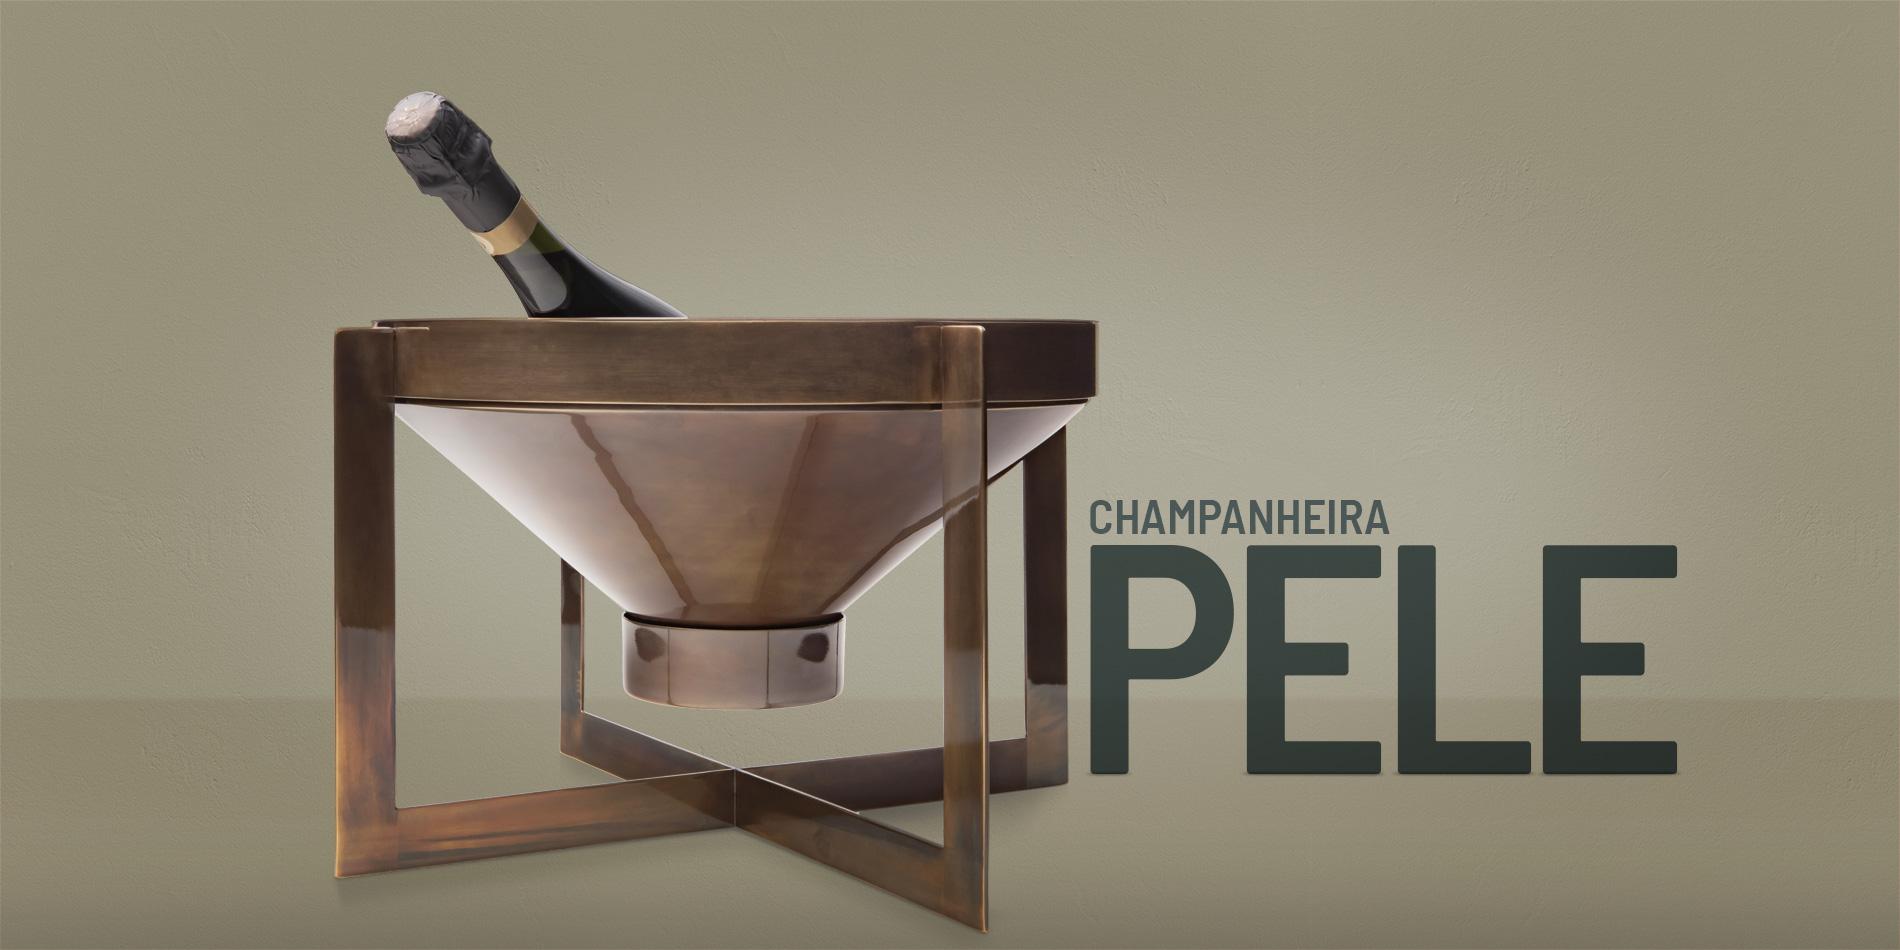 champanheira pele